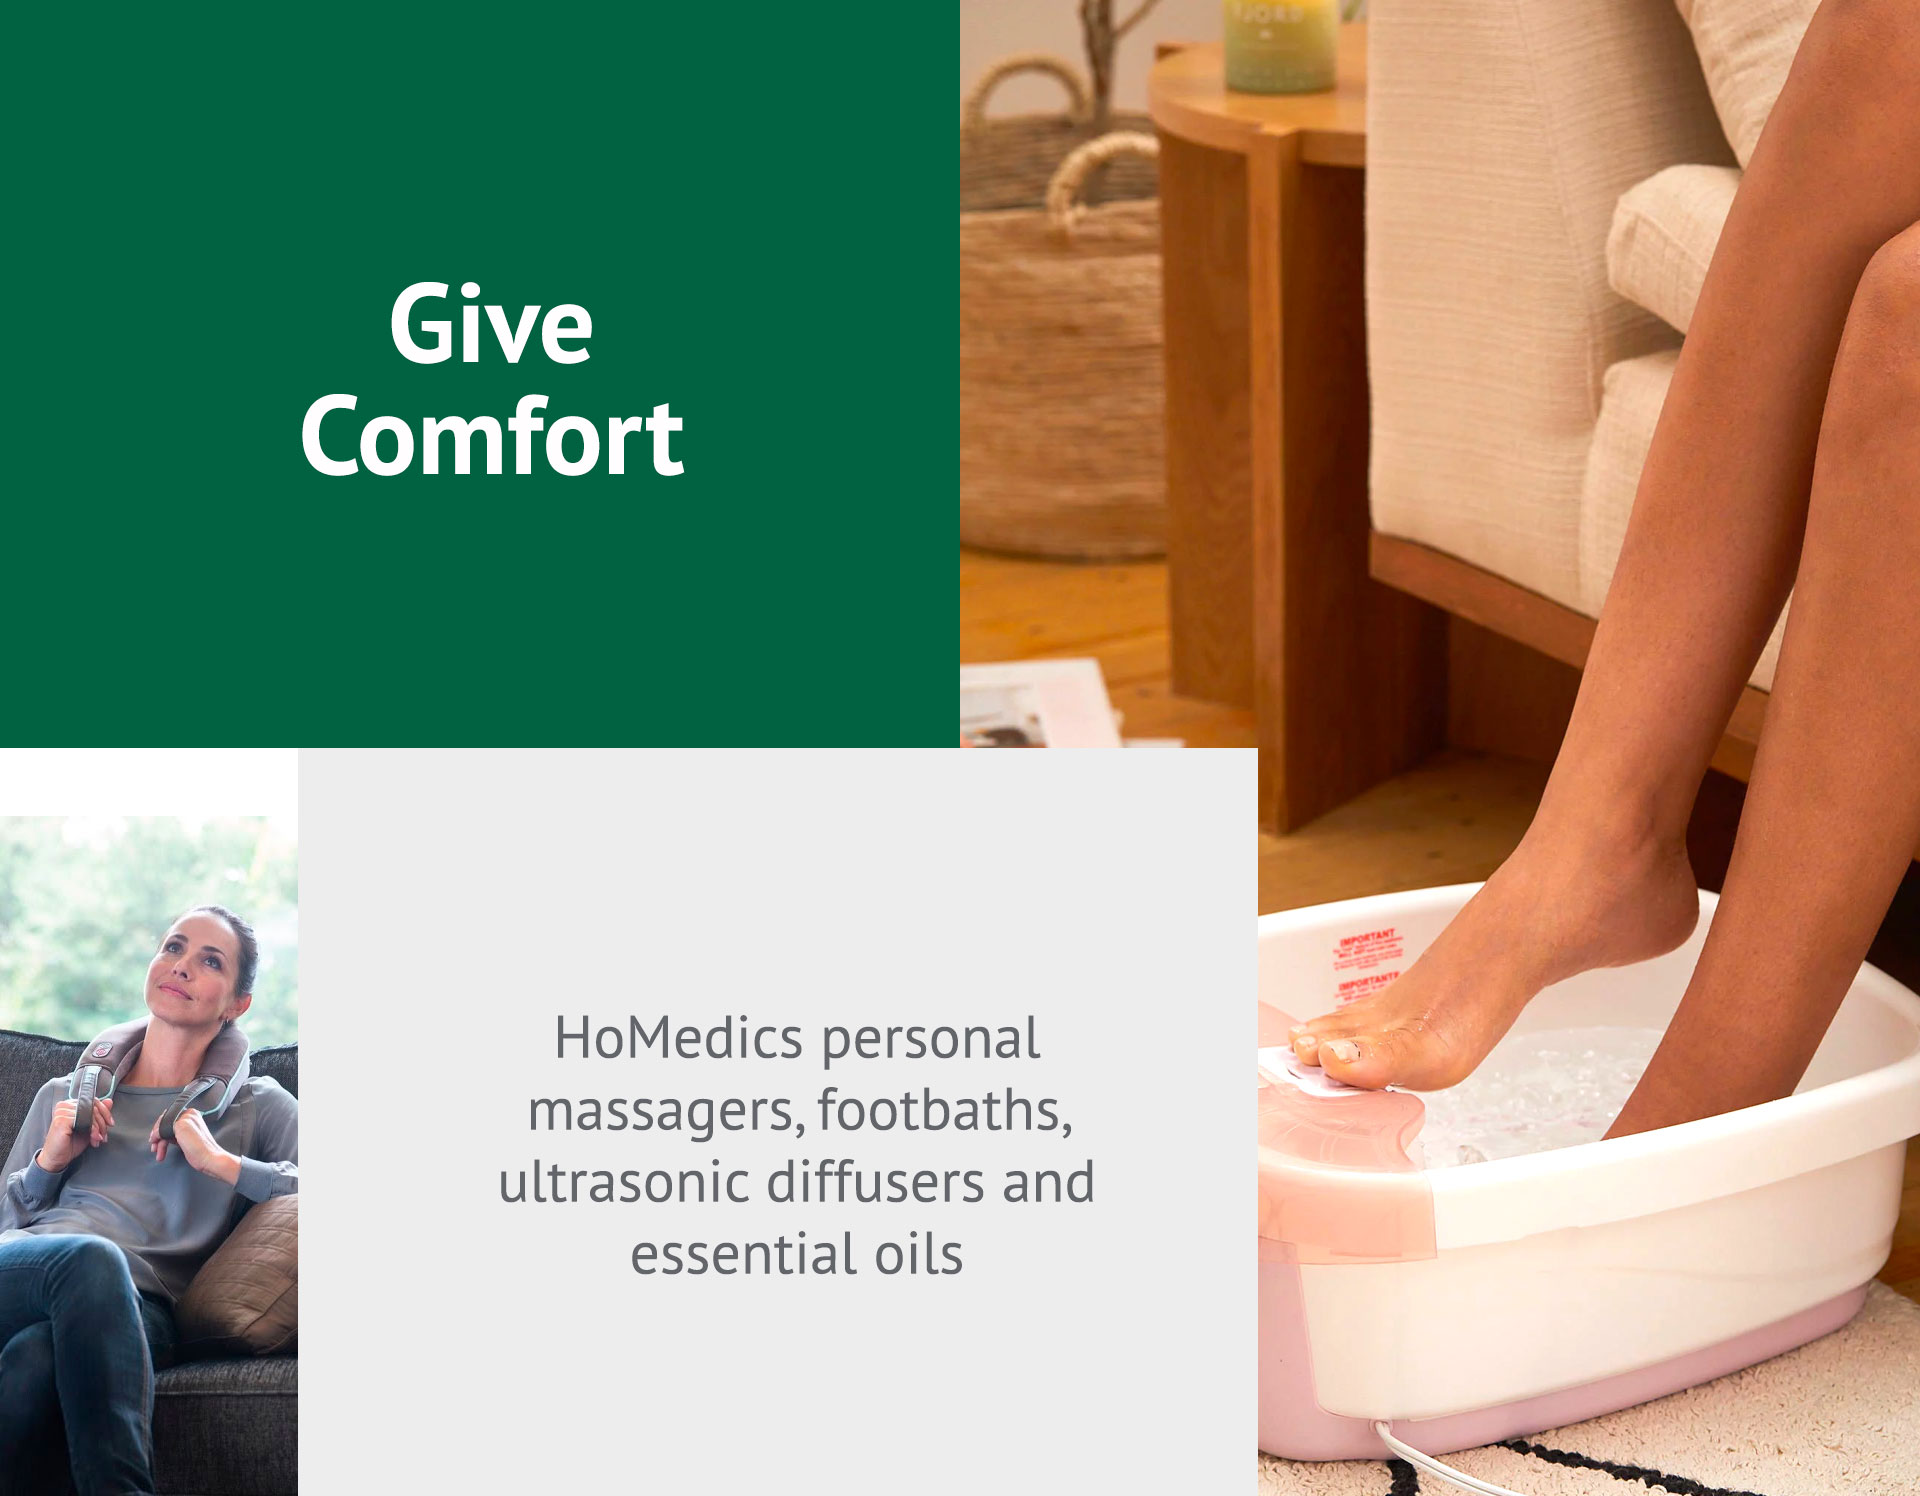 HoMedics personal massagers, footbaths, ultrasonic diffusers and essential oils